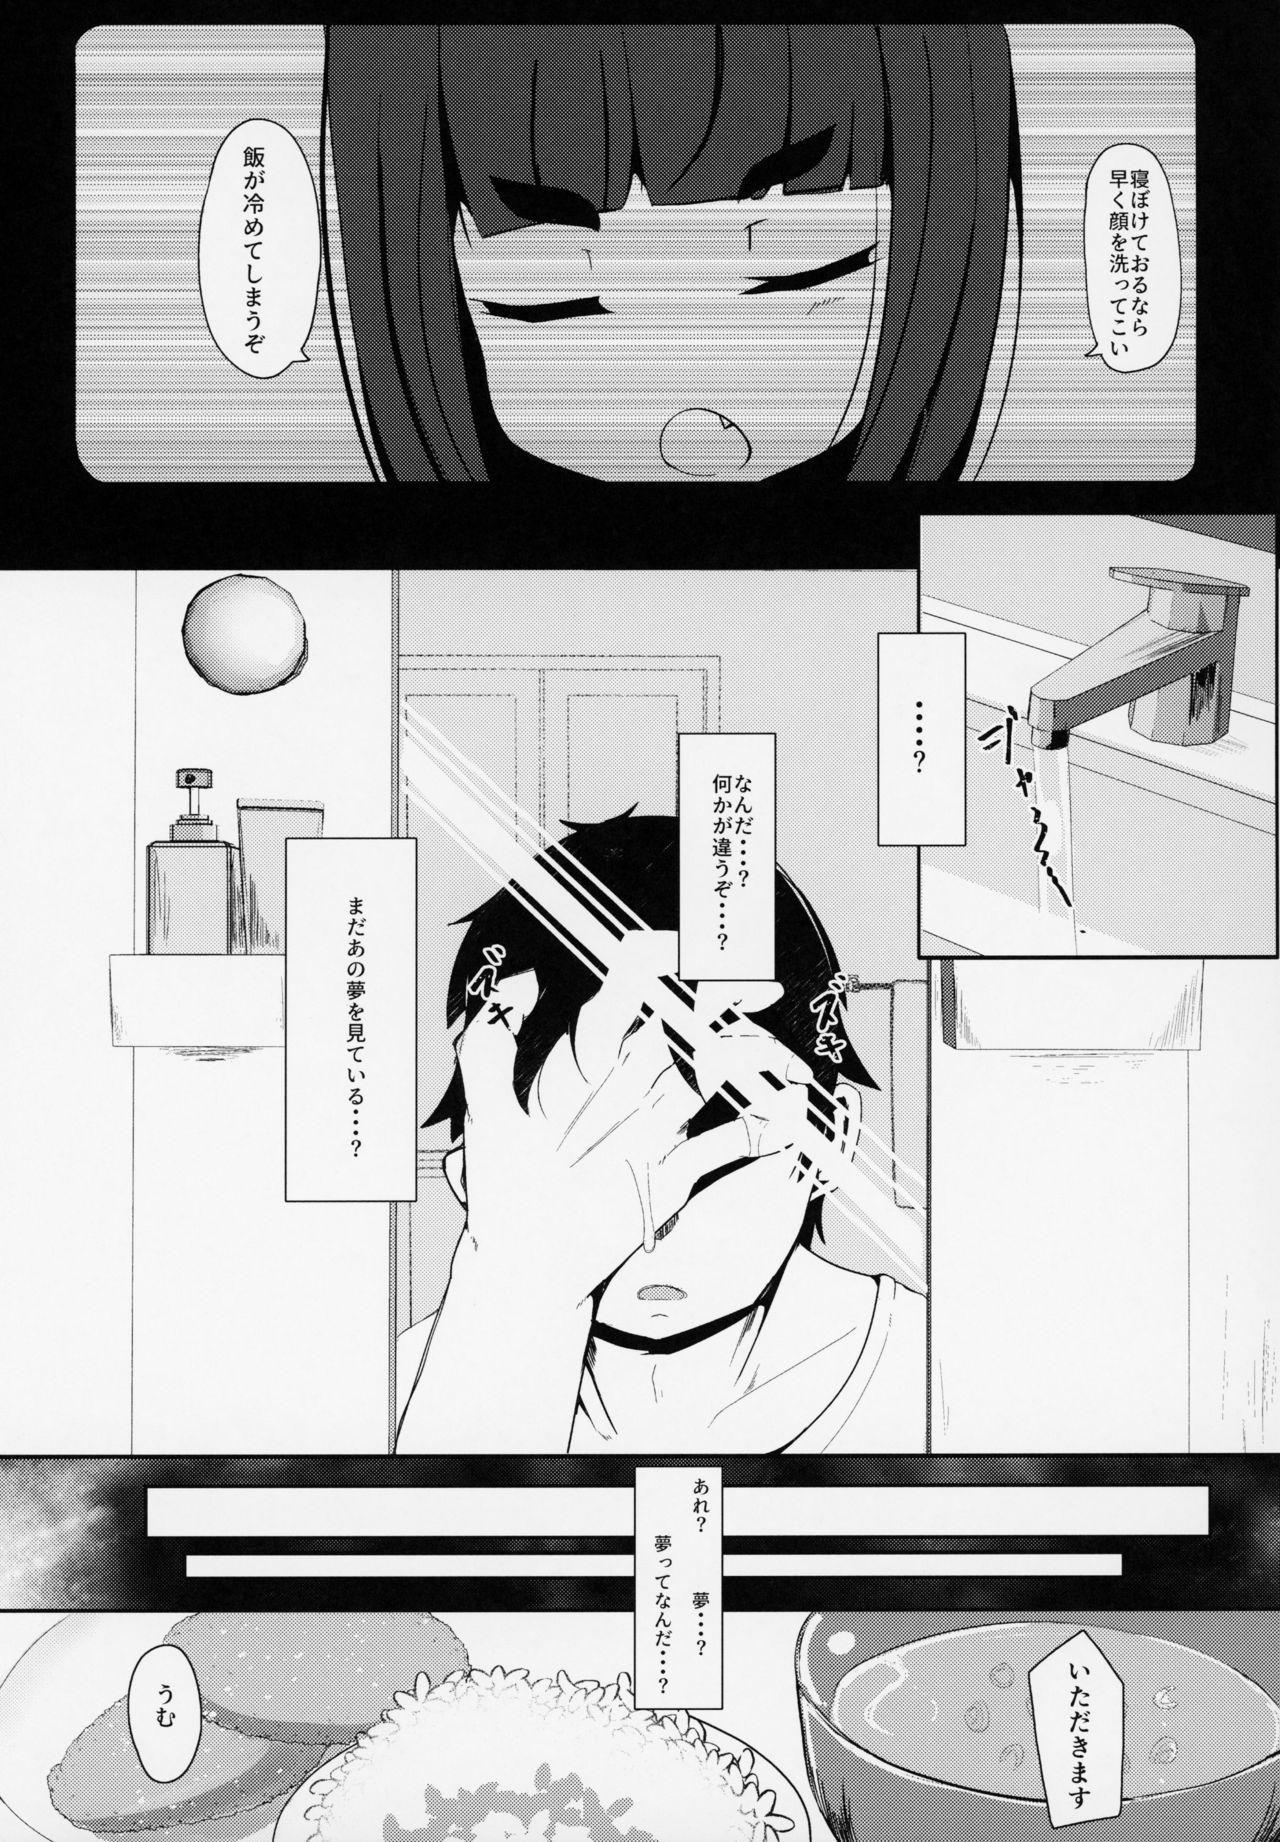 (COMITIA127) [Manpuchi (Nekodel)] Uro -Makuai- Kanwa 7